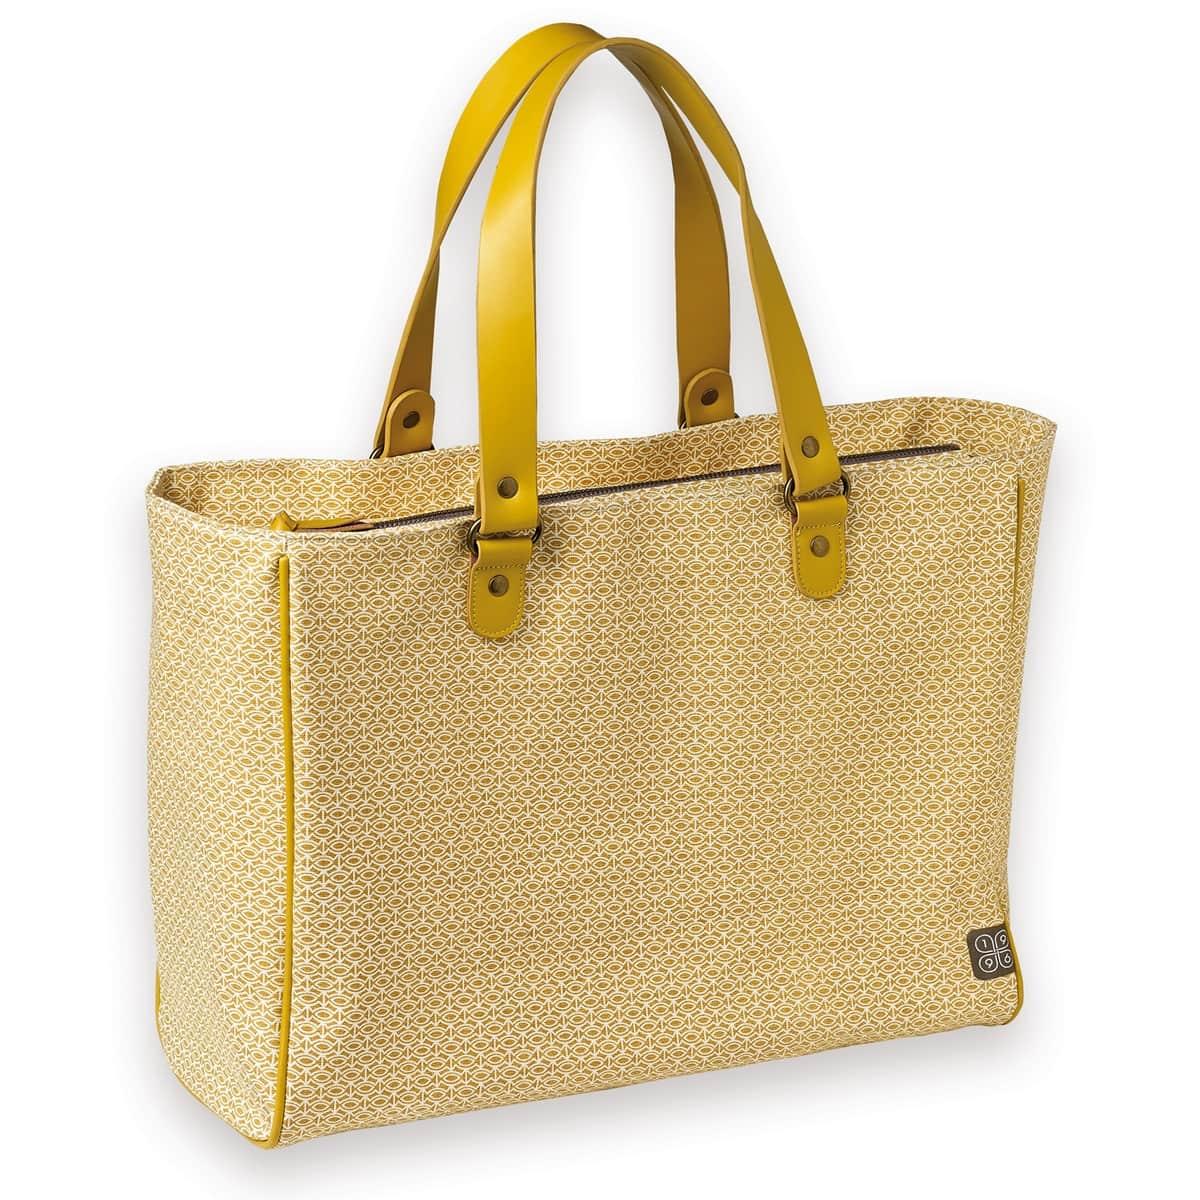 Nákupní kabelka Yellow